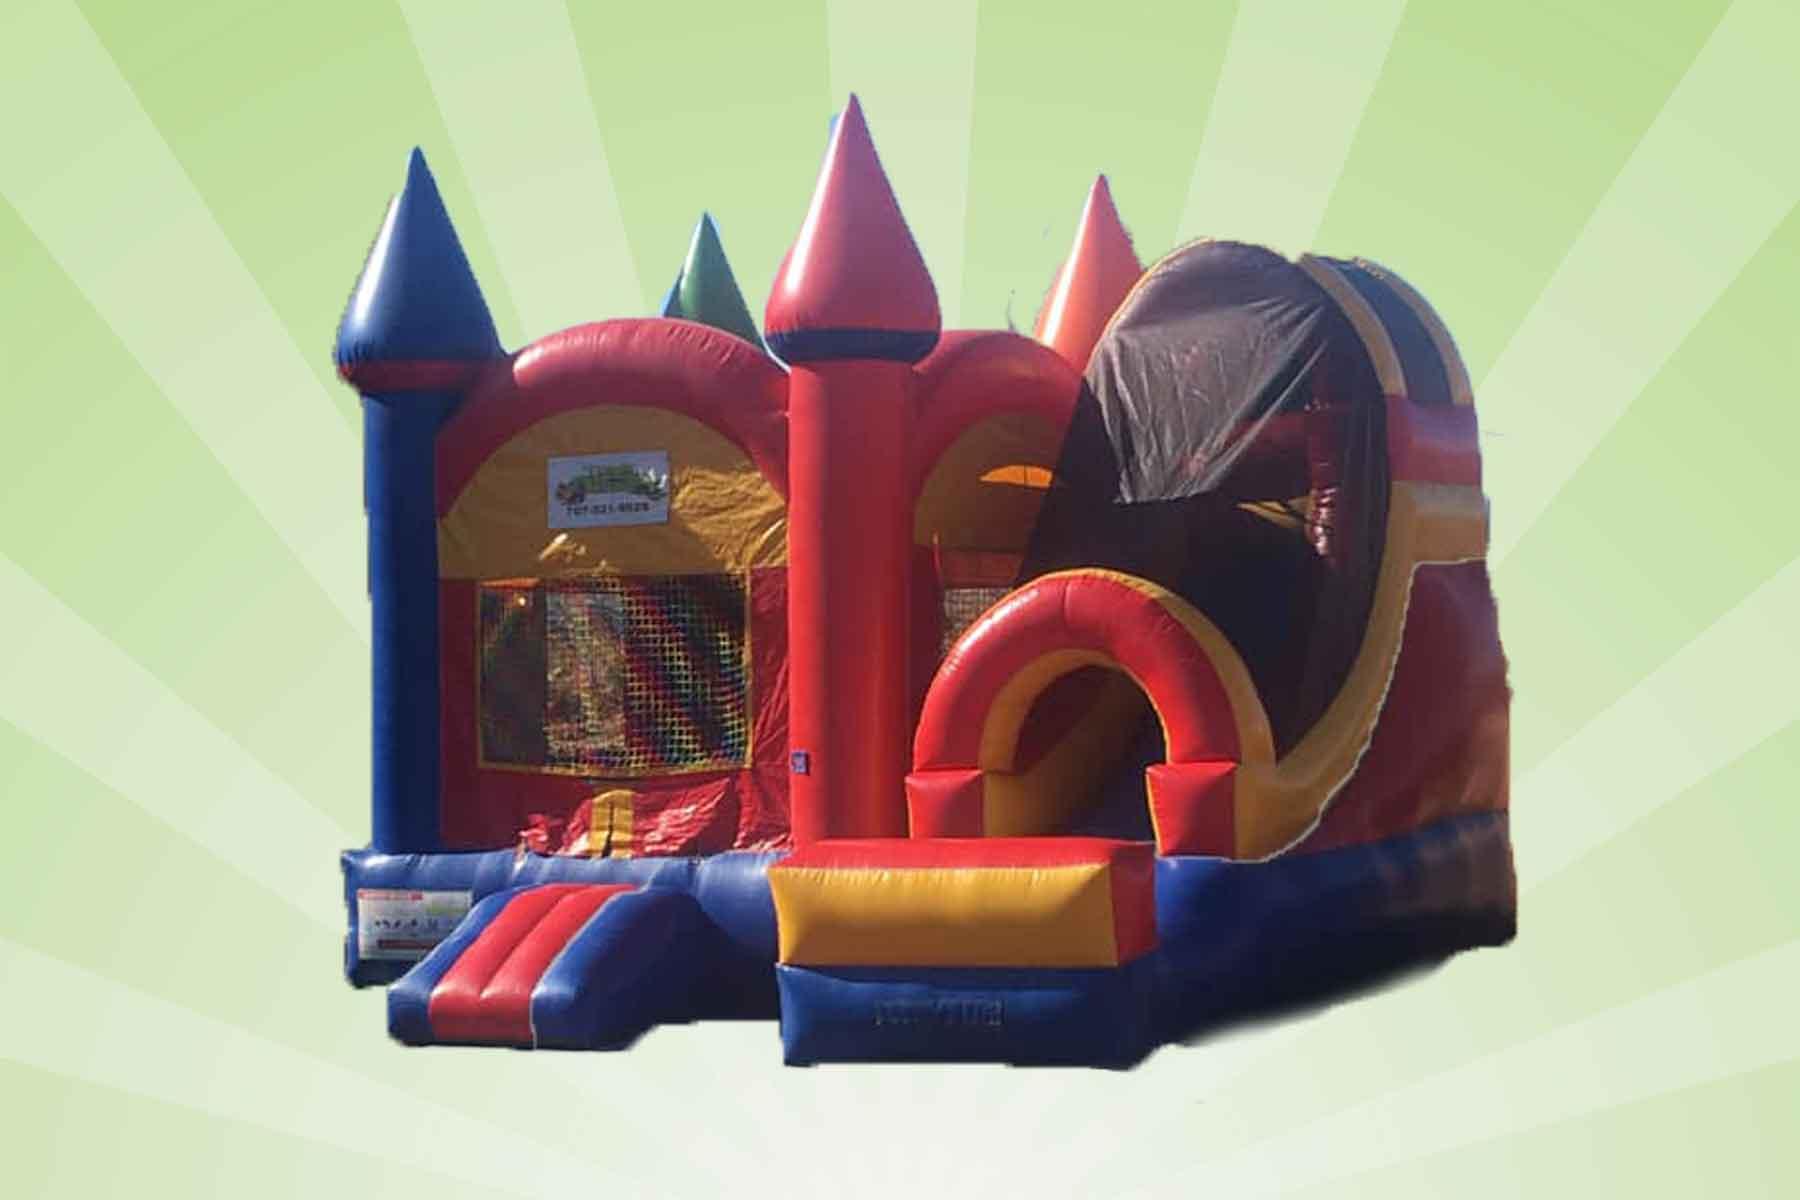 Castle Combo Bounce House Rental